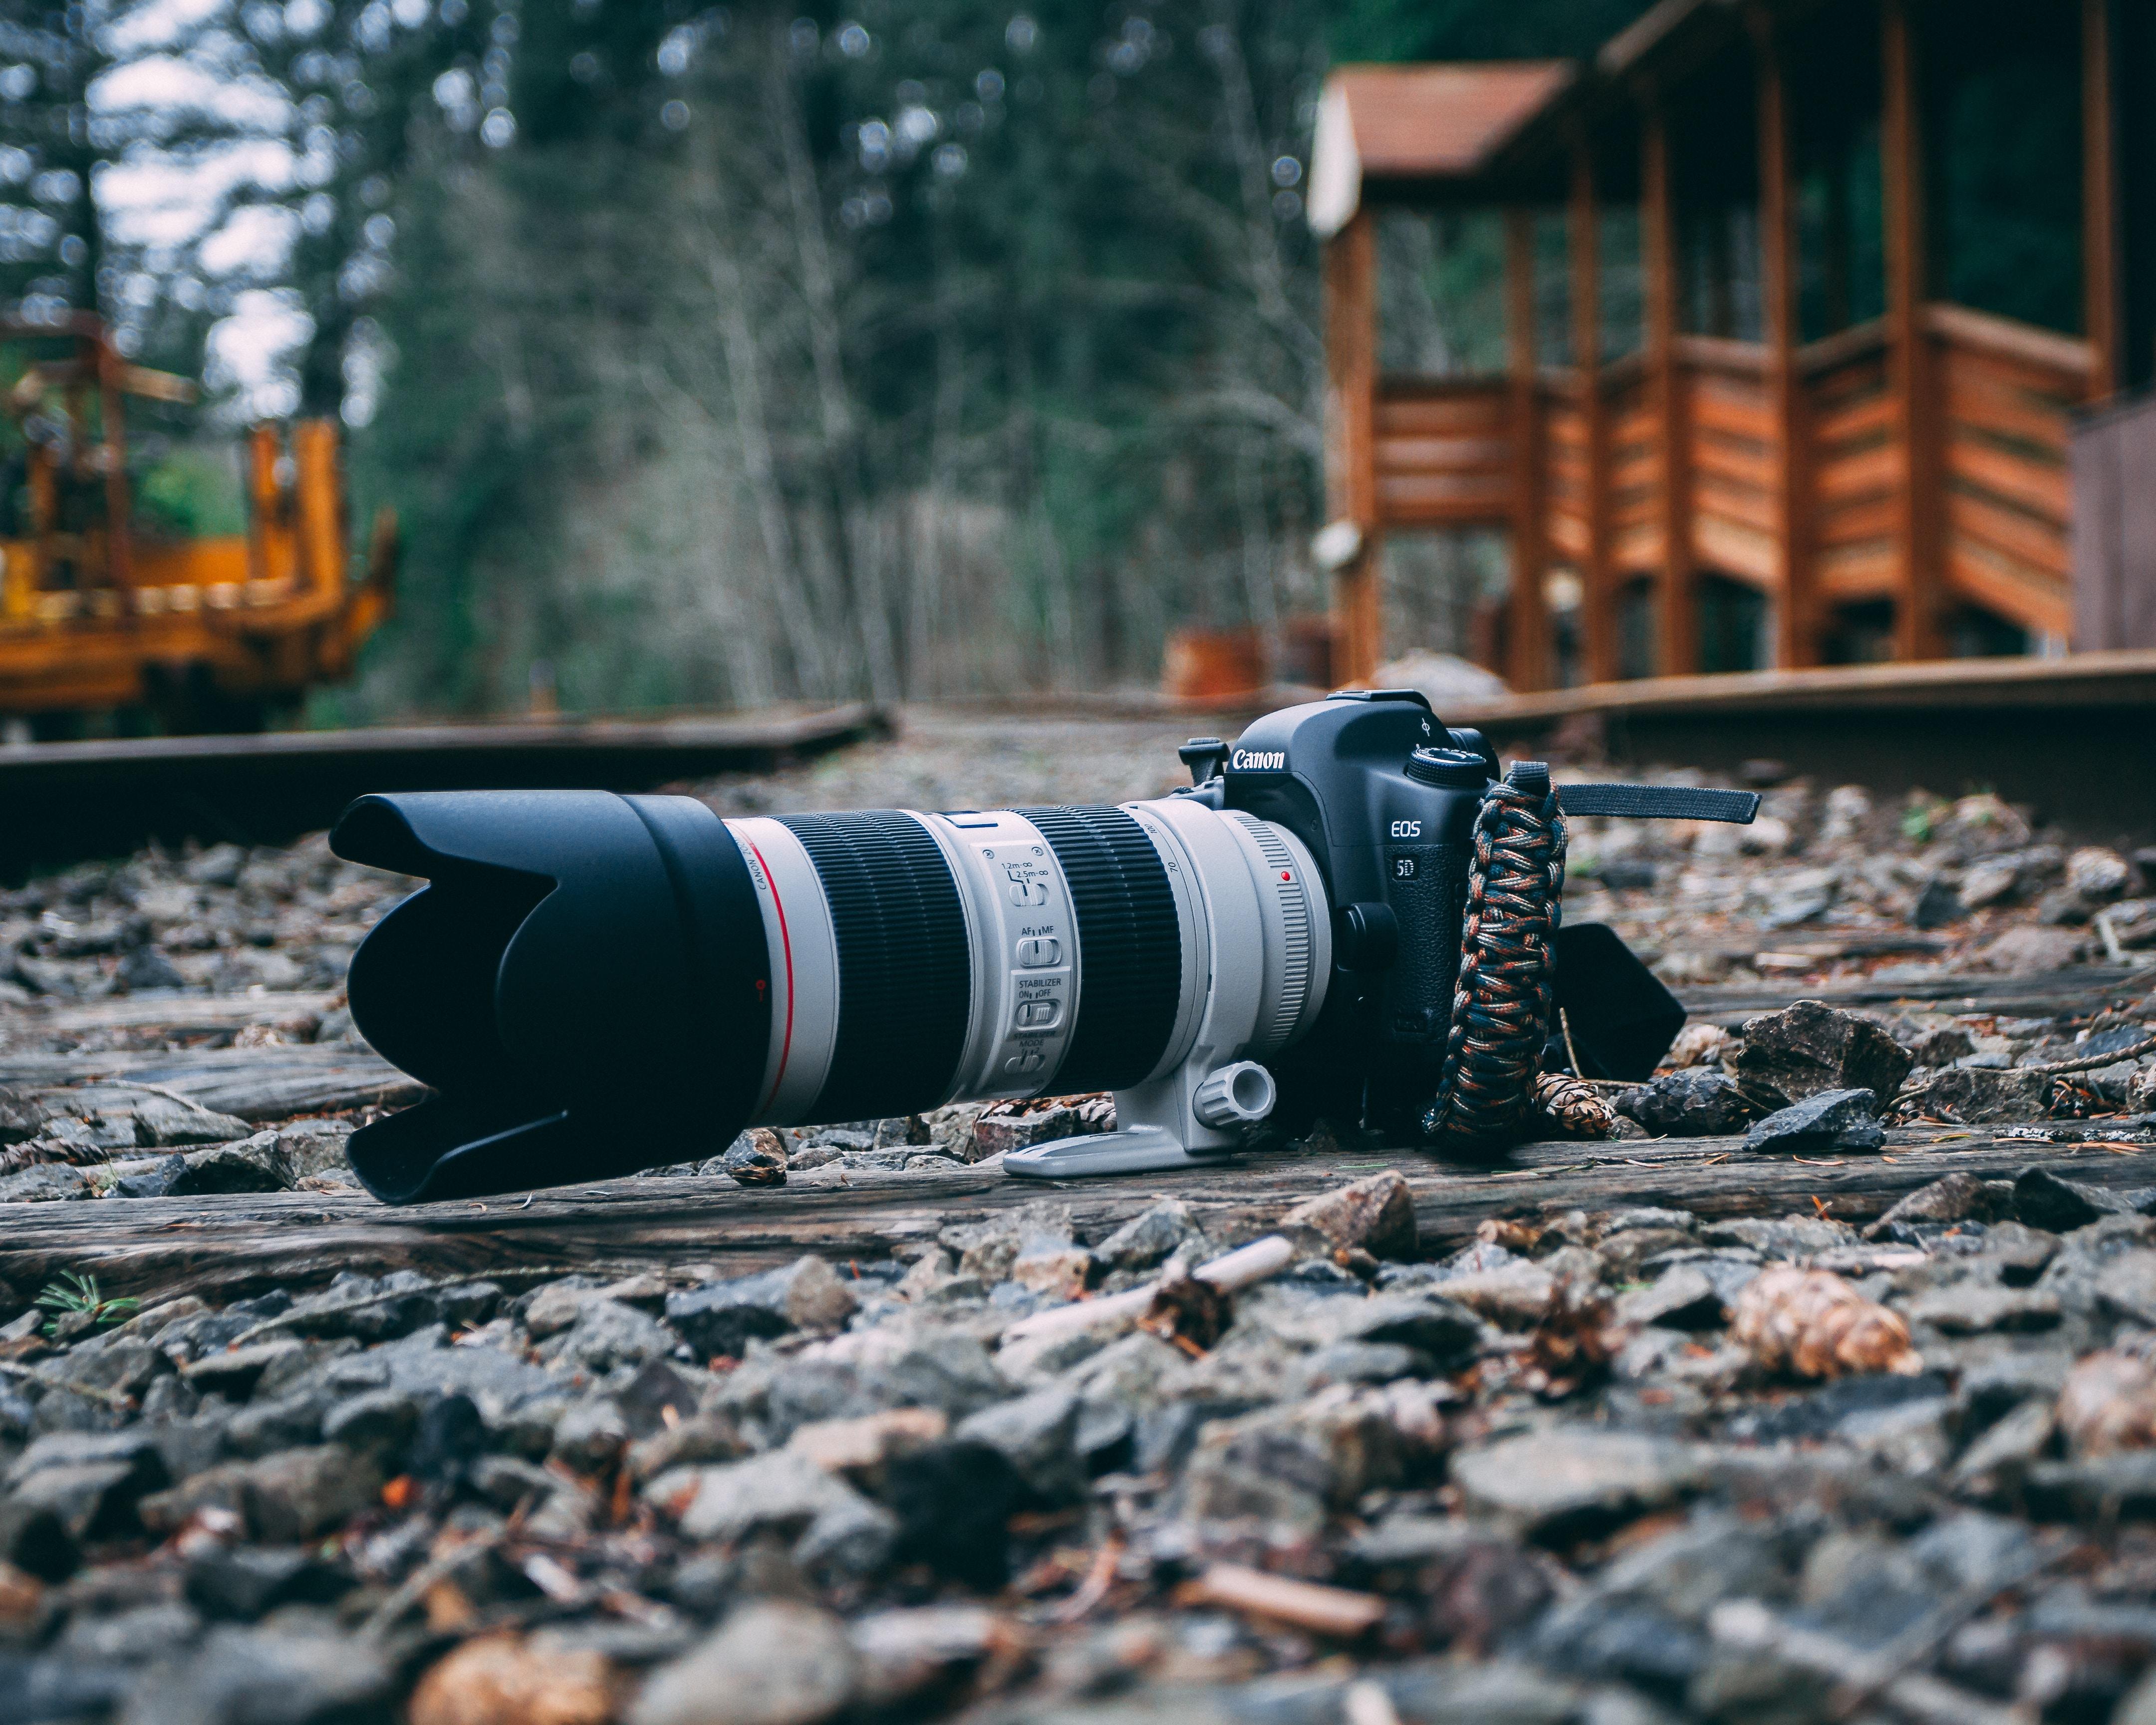 white and black DSLR camera on stone-filled ground near wooden establishment